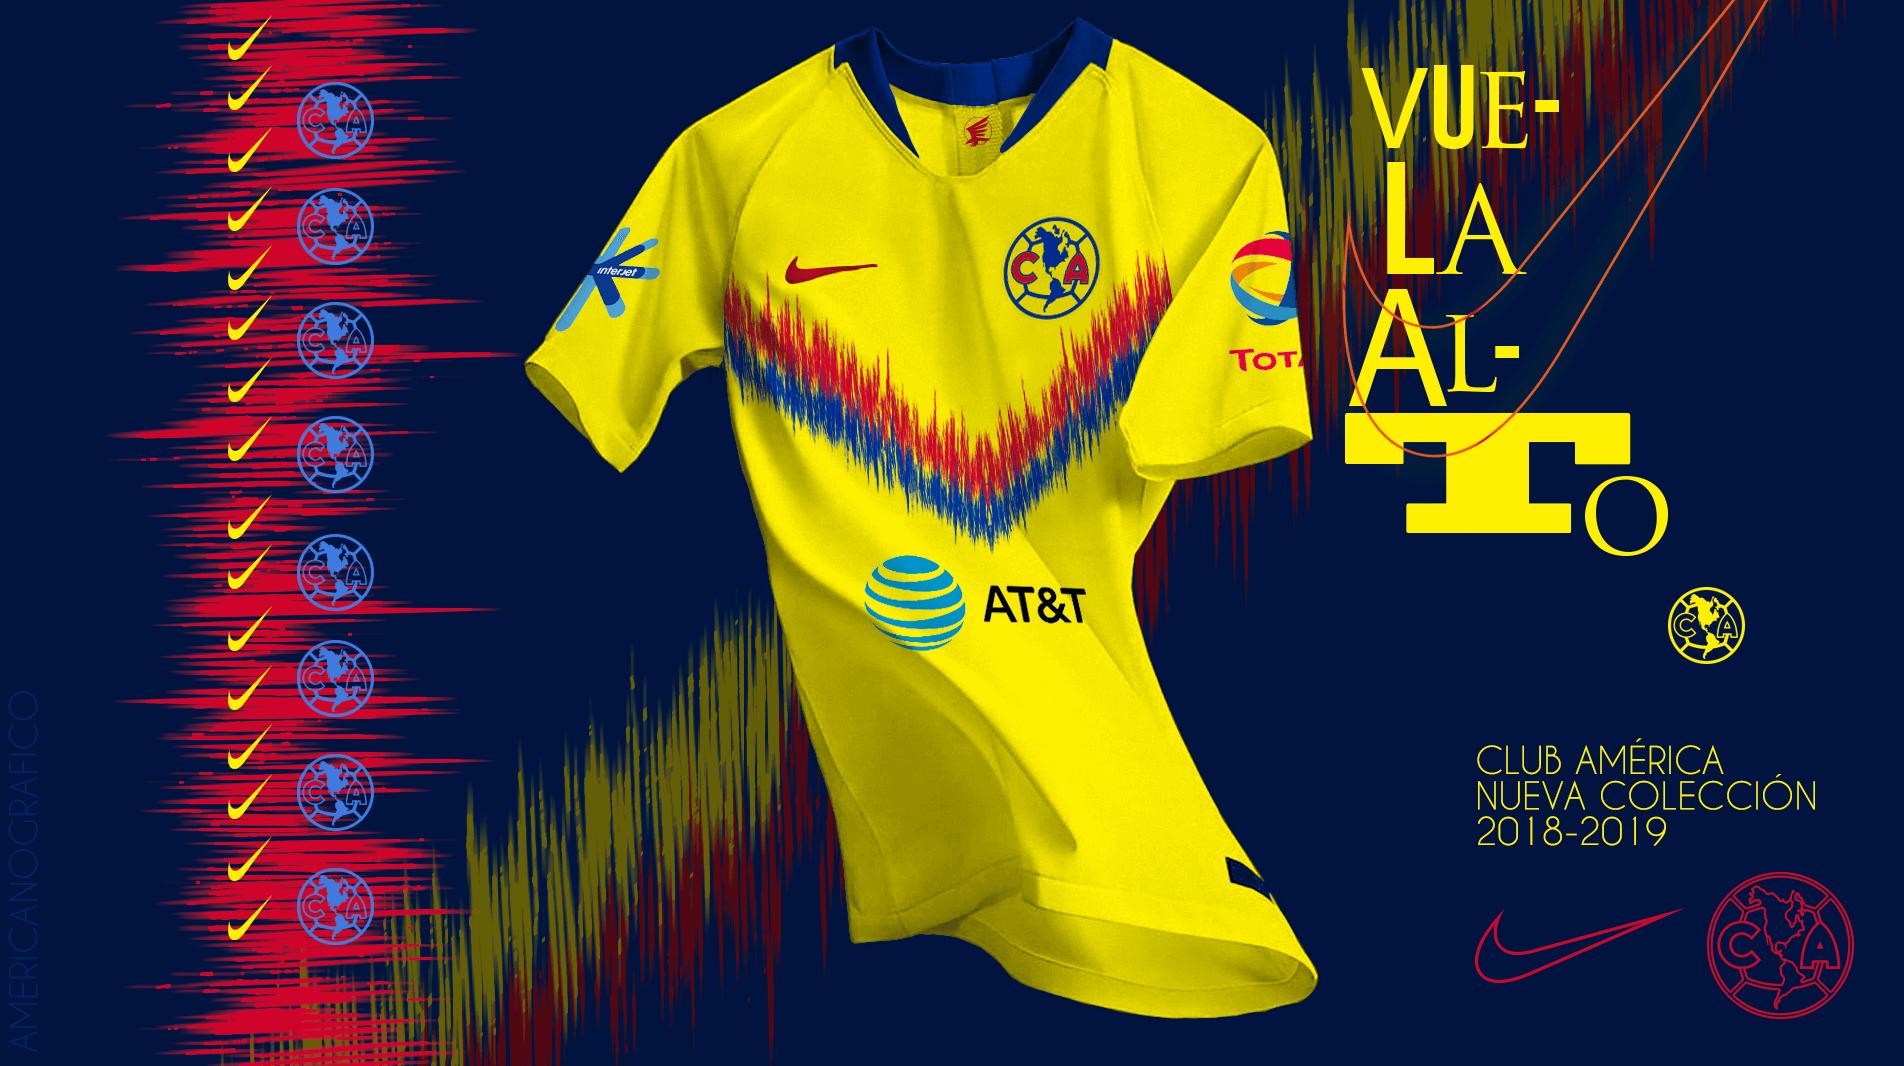 finest selection 02007 0a05d Colección 2018-2019 Nike Club América   LAS SUPER AGUILAS DE ...